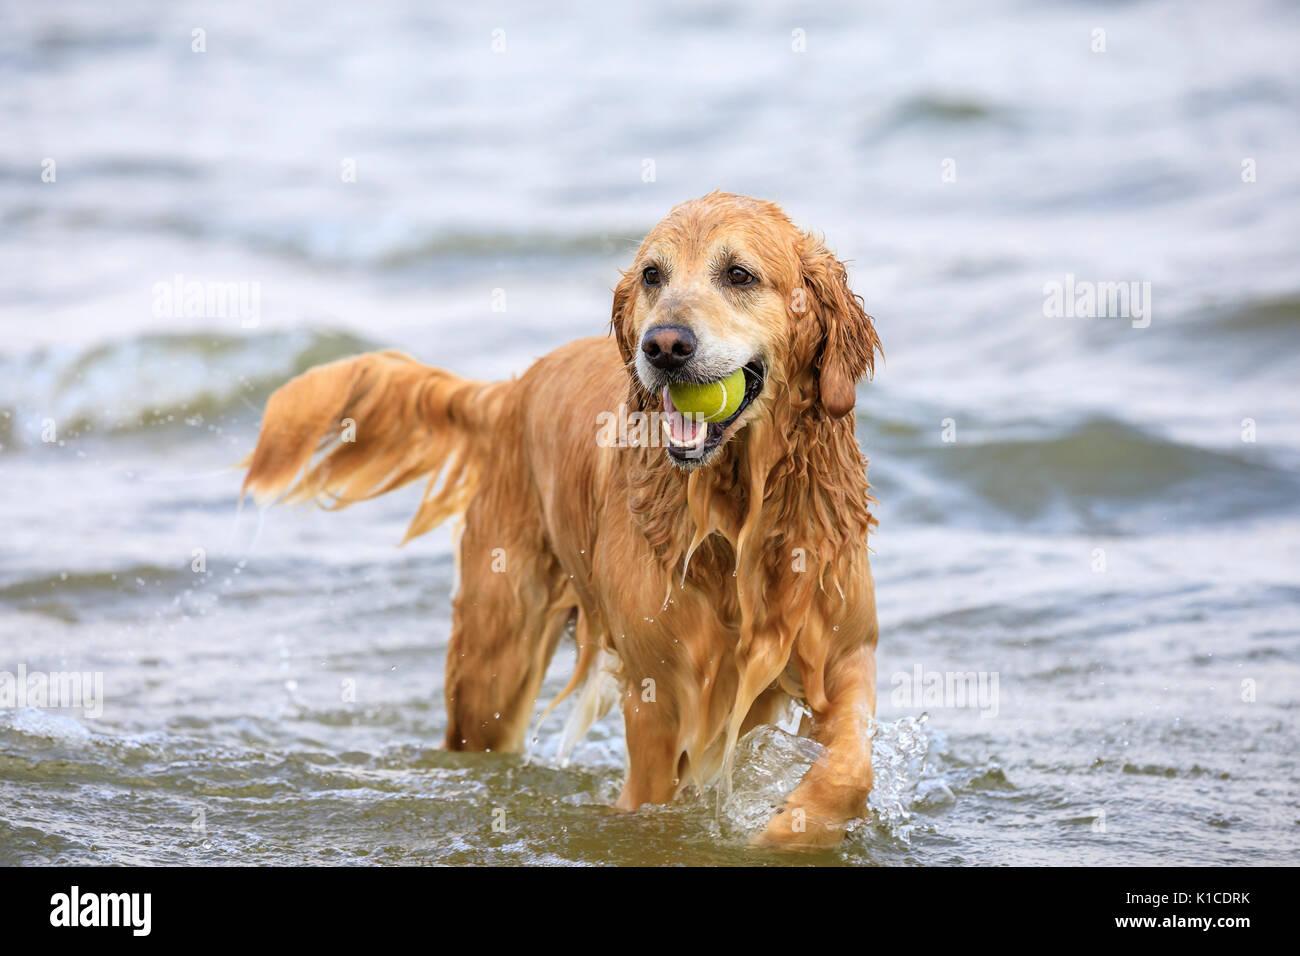 Wet Golden Retriever, fetching tennis ball from Lake Winnipeg, Gimli, Manitoba, Canada. - Stock Image